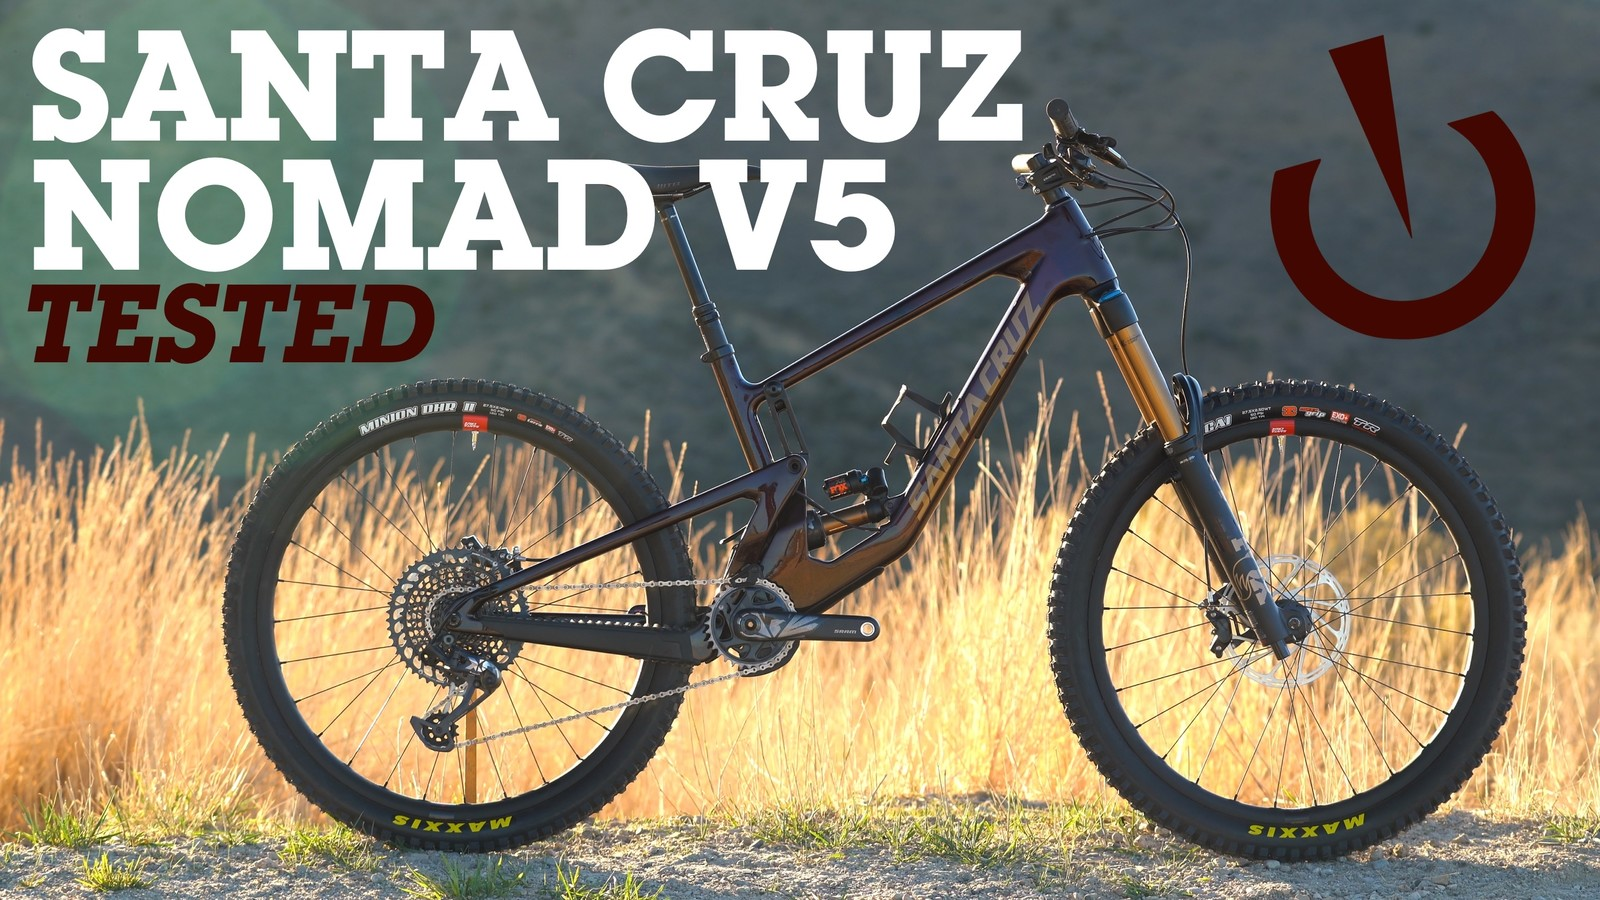 REVIEW - 2021 Santa Cruz Nomad - Go Anywhere, Do Anything